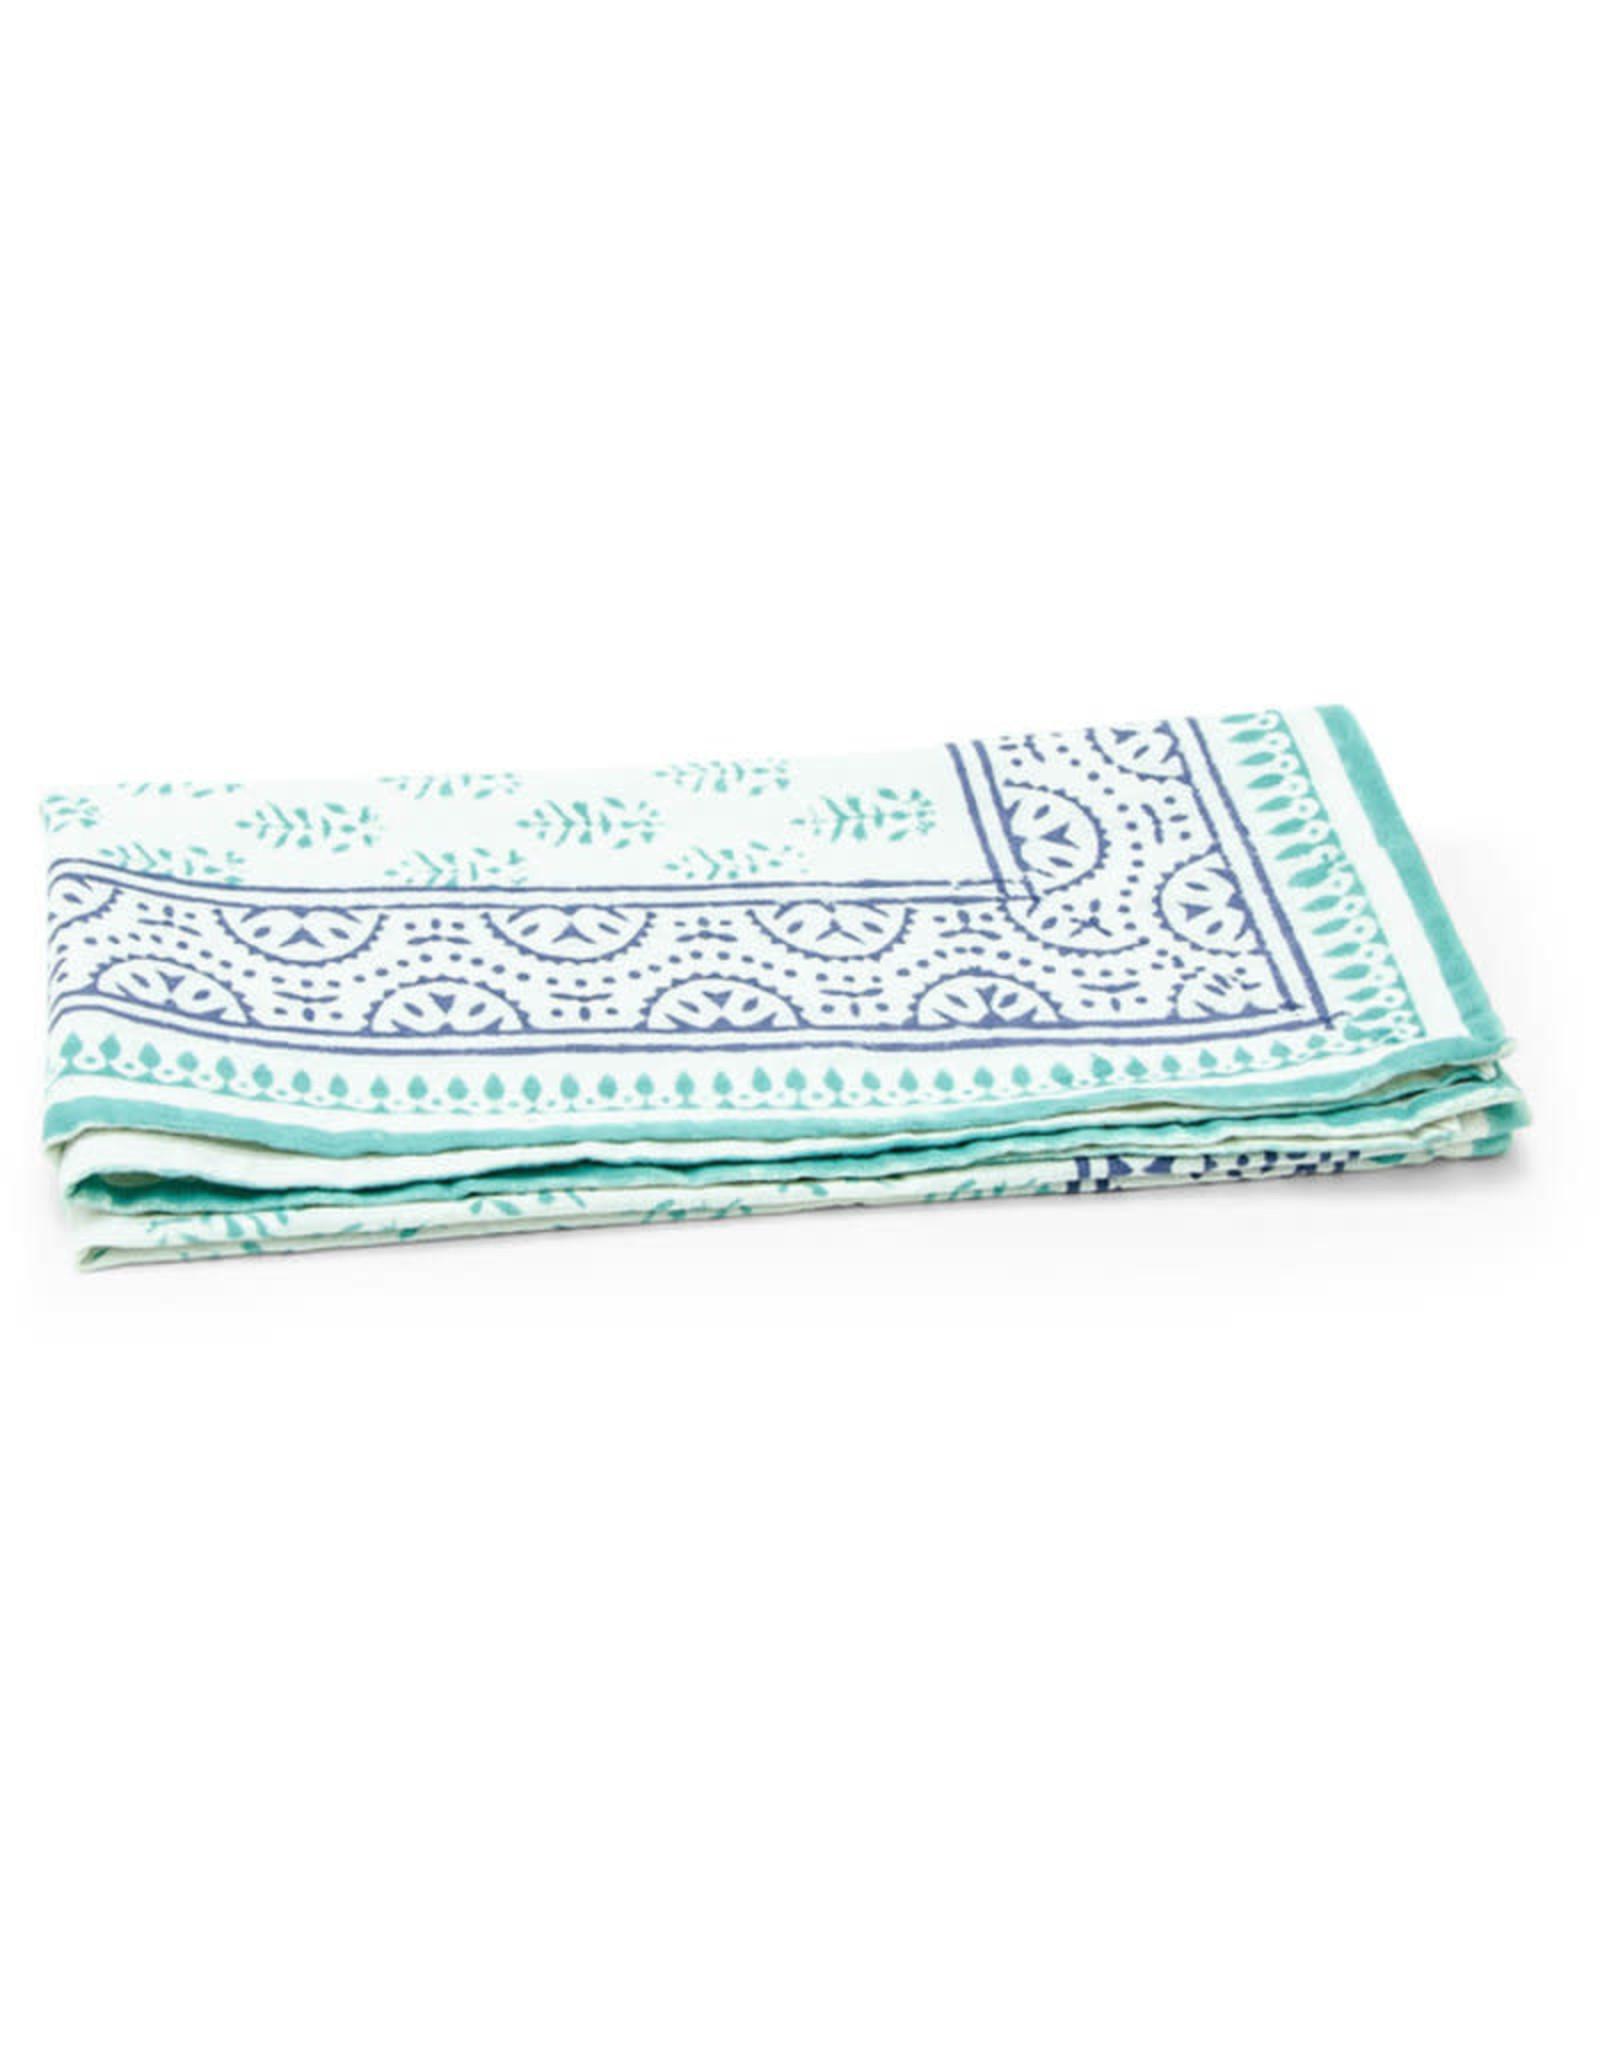 Asha Handicrafts Turquoise Chevron Napkin